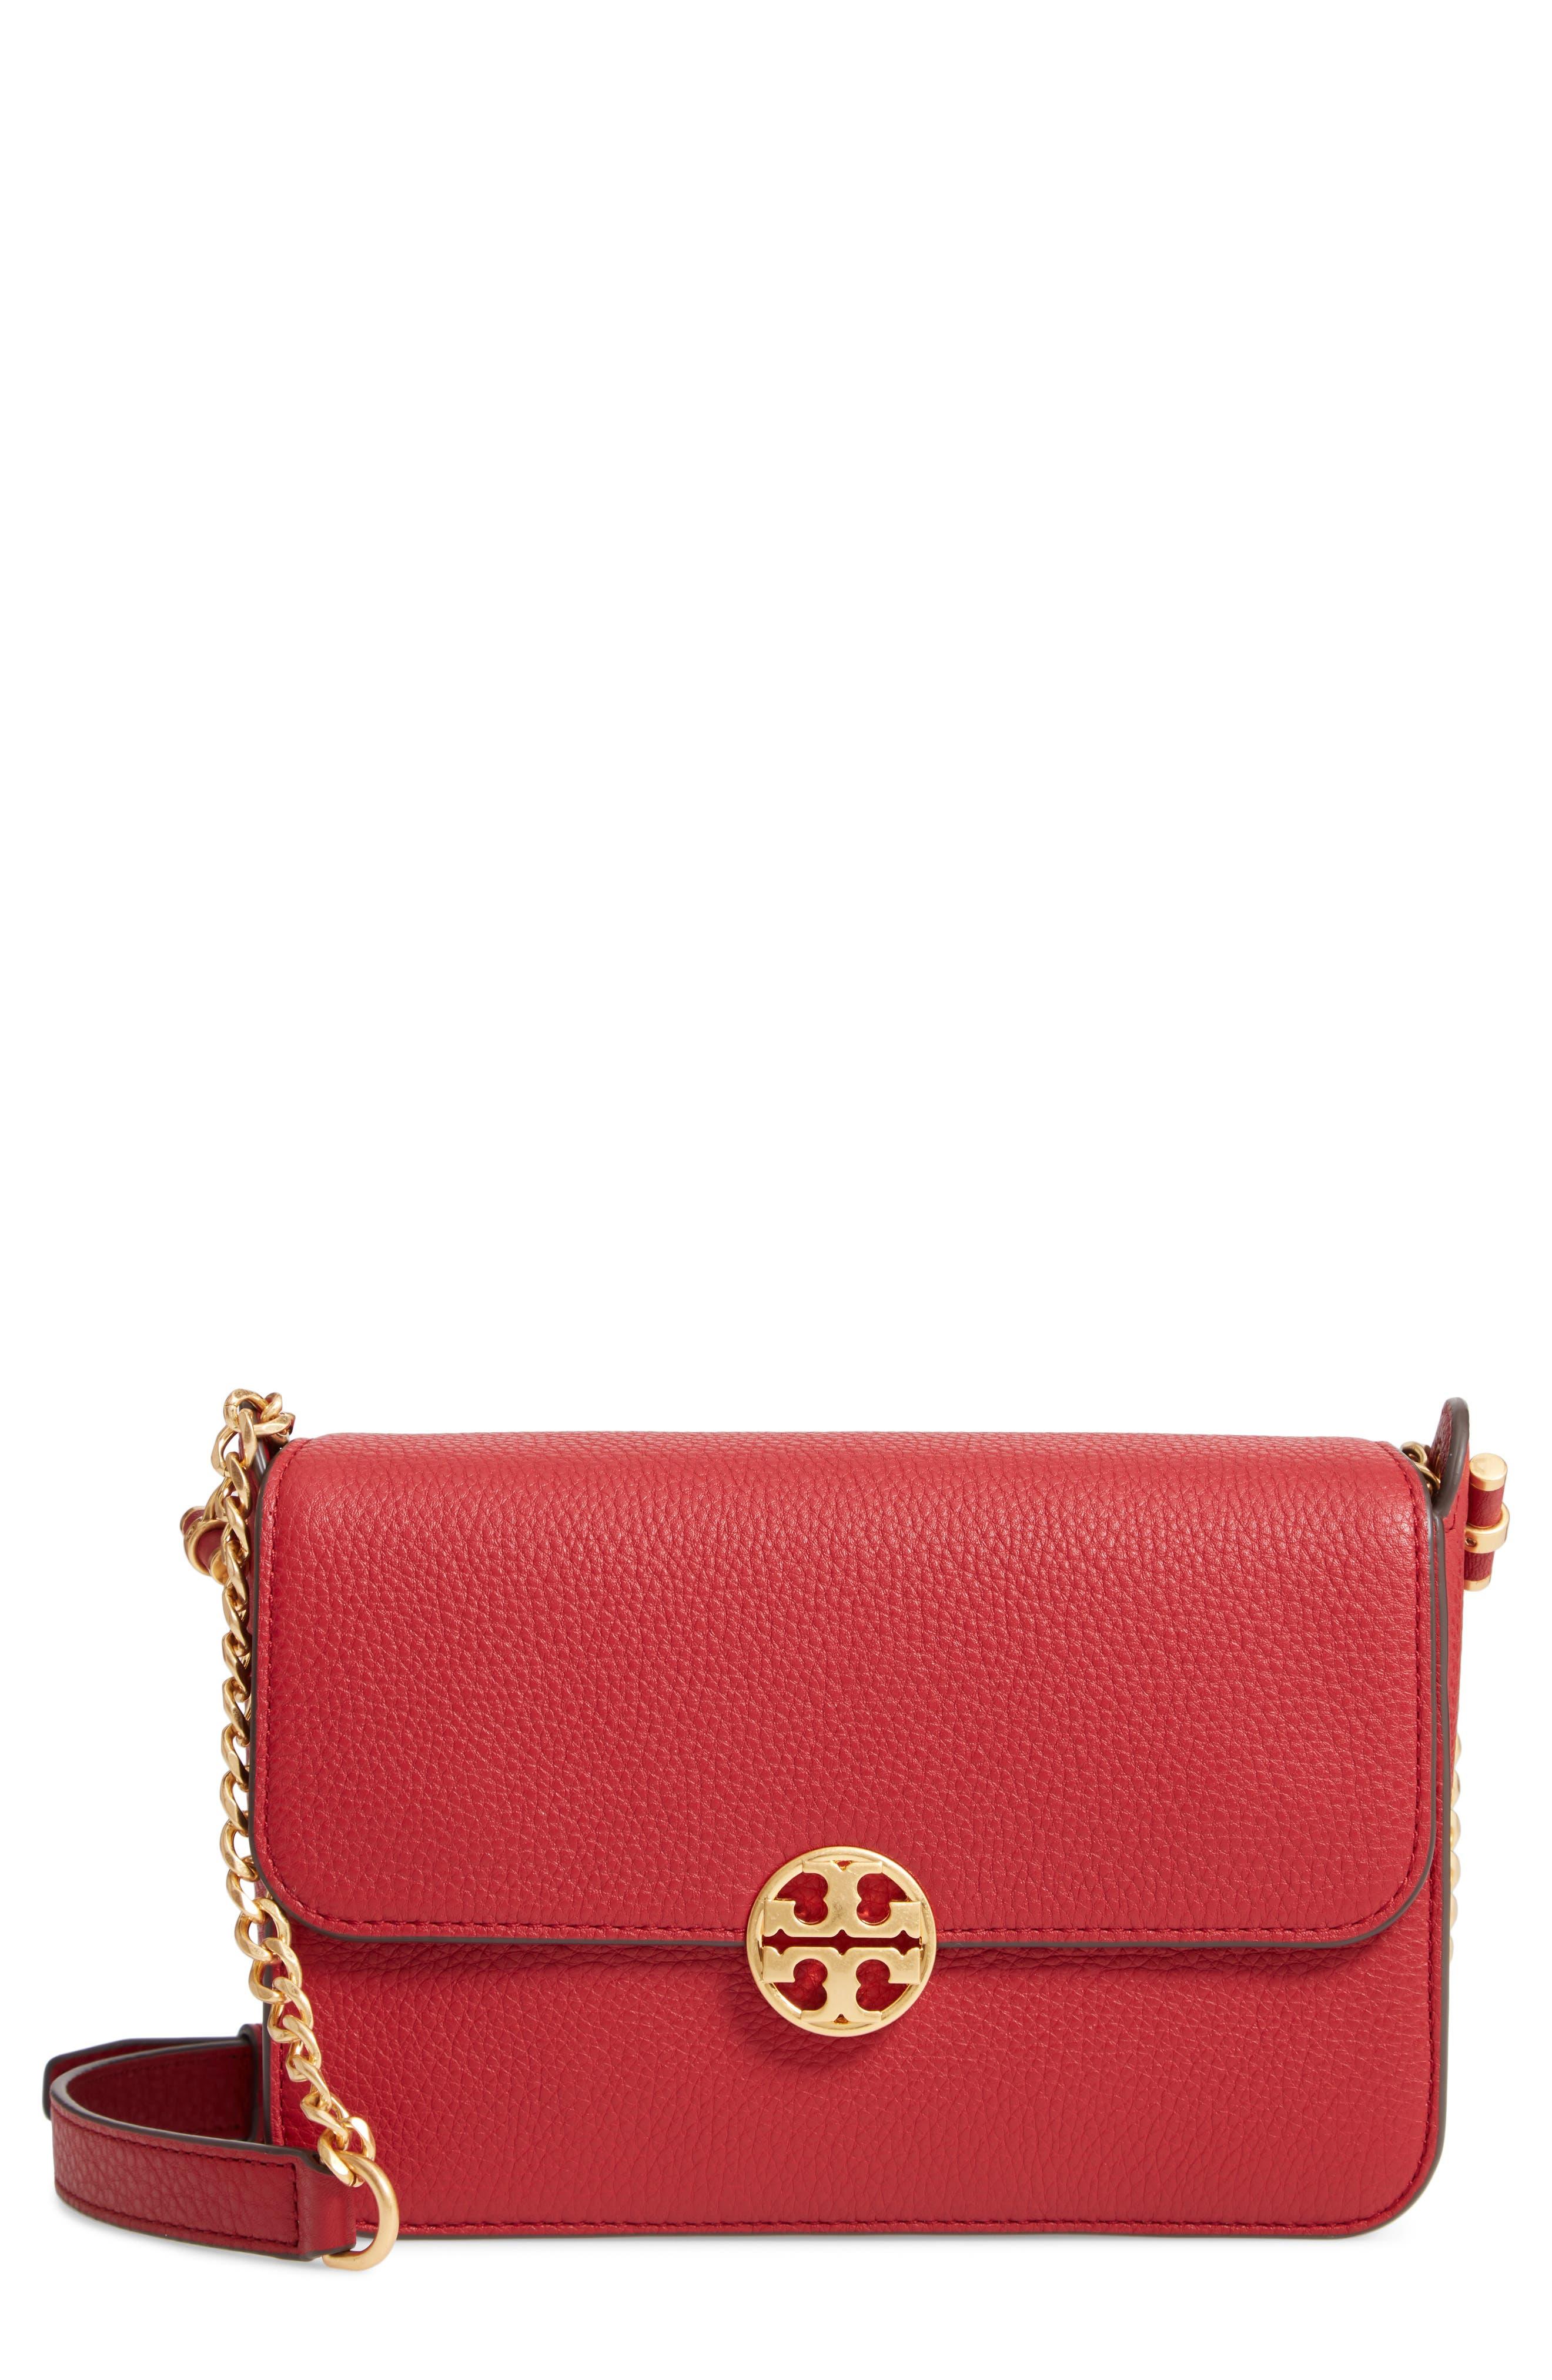 Chelsea Leather Crossbody Bag,                             Main thumbnail 1, color,                             REDSTONE